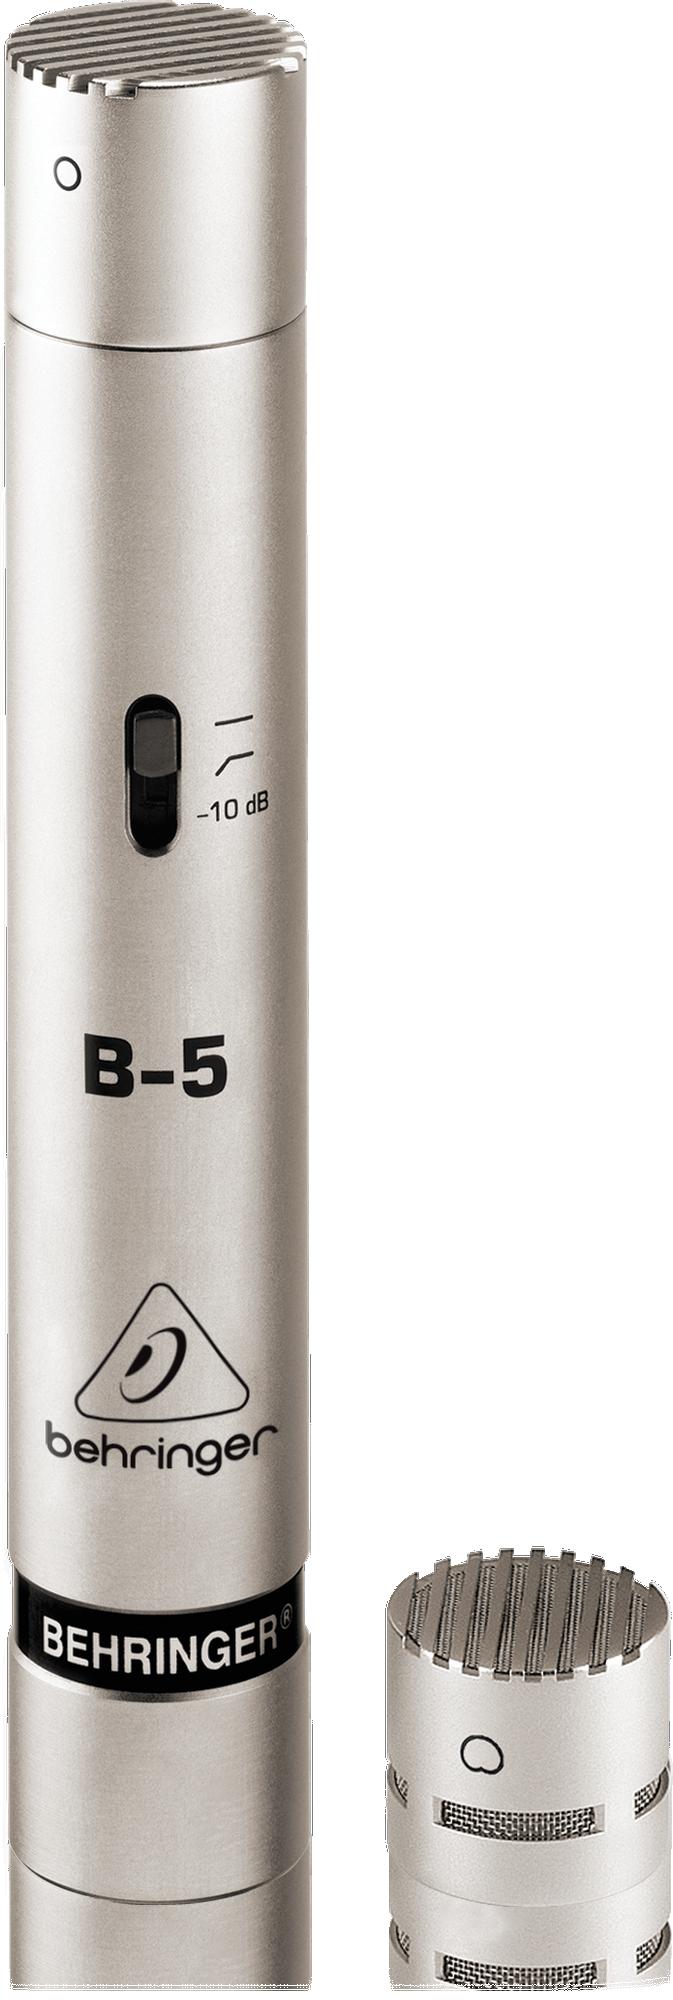 Behringer B-5 kondensaatormikrofon